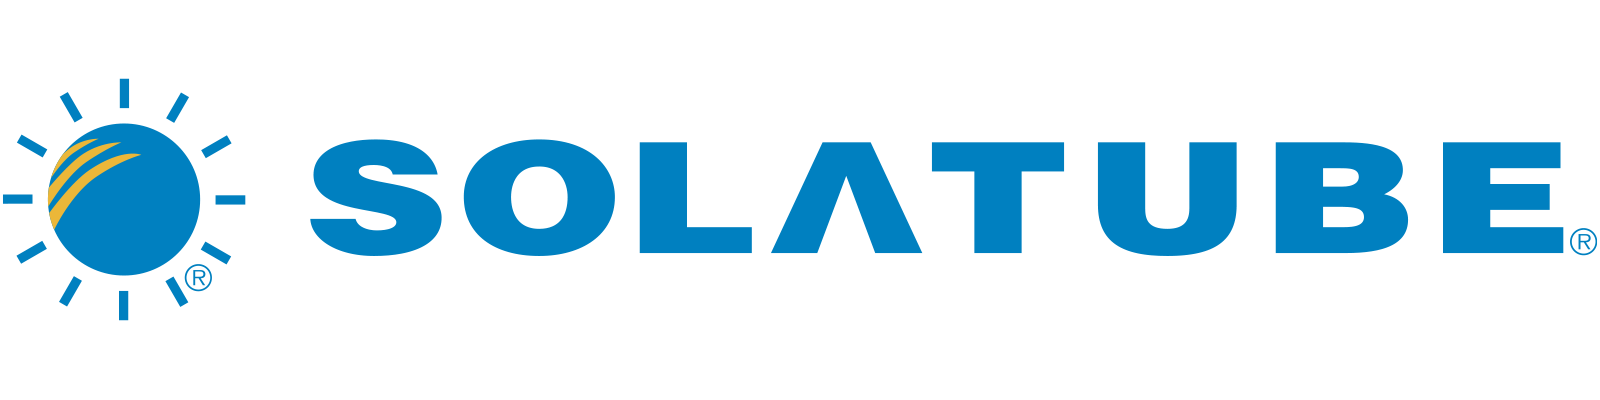 Solatube-Residential-Daylighting-&-Ventilation-logo